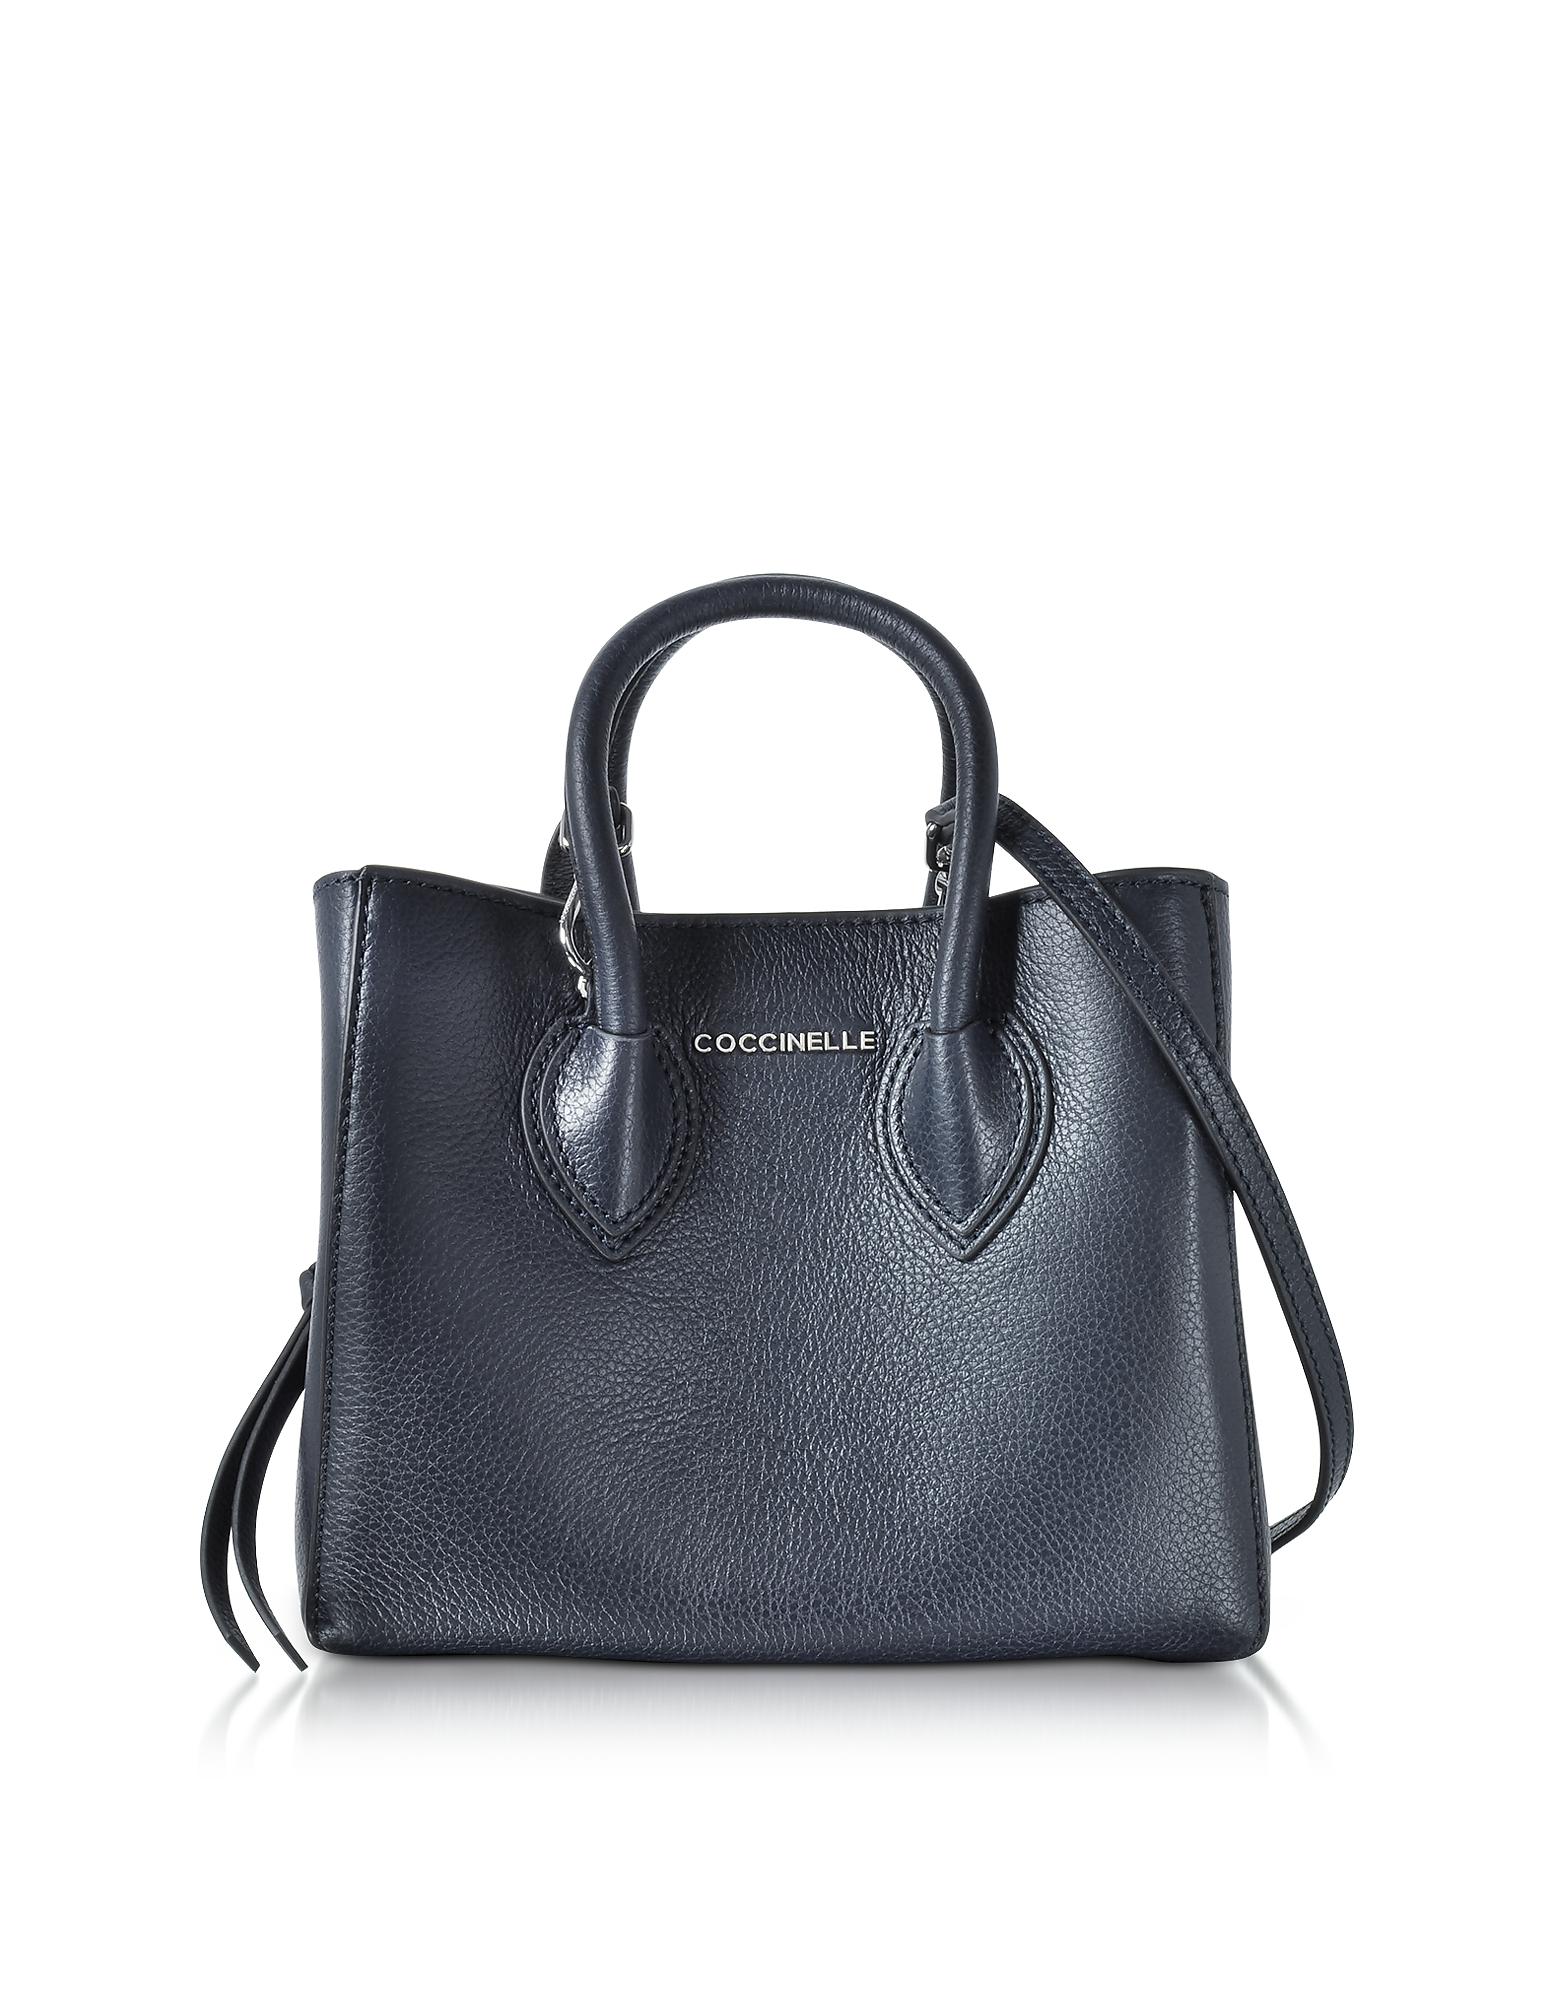 Coccinelle Handbags, Farisa Blue Pebbled Leather Mini Tote Bag